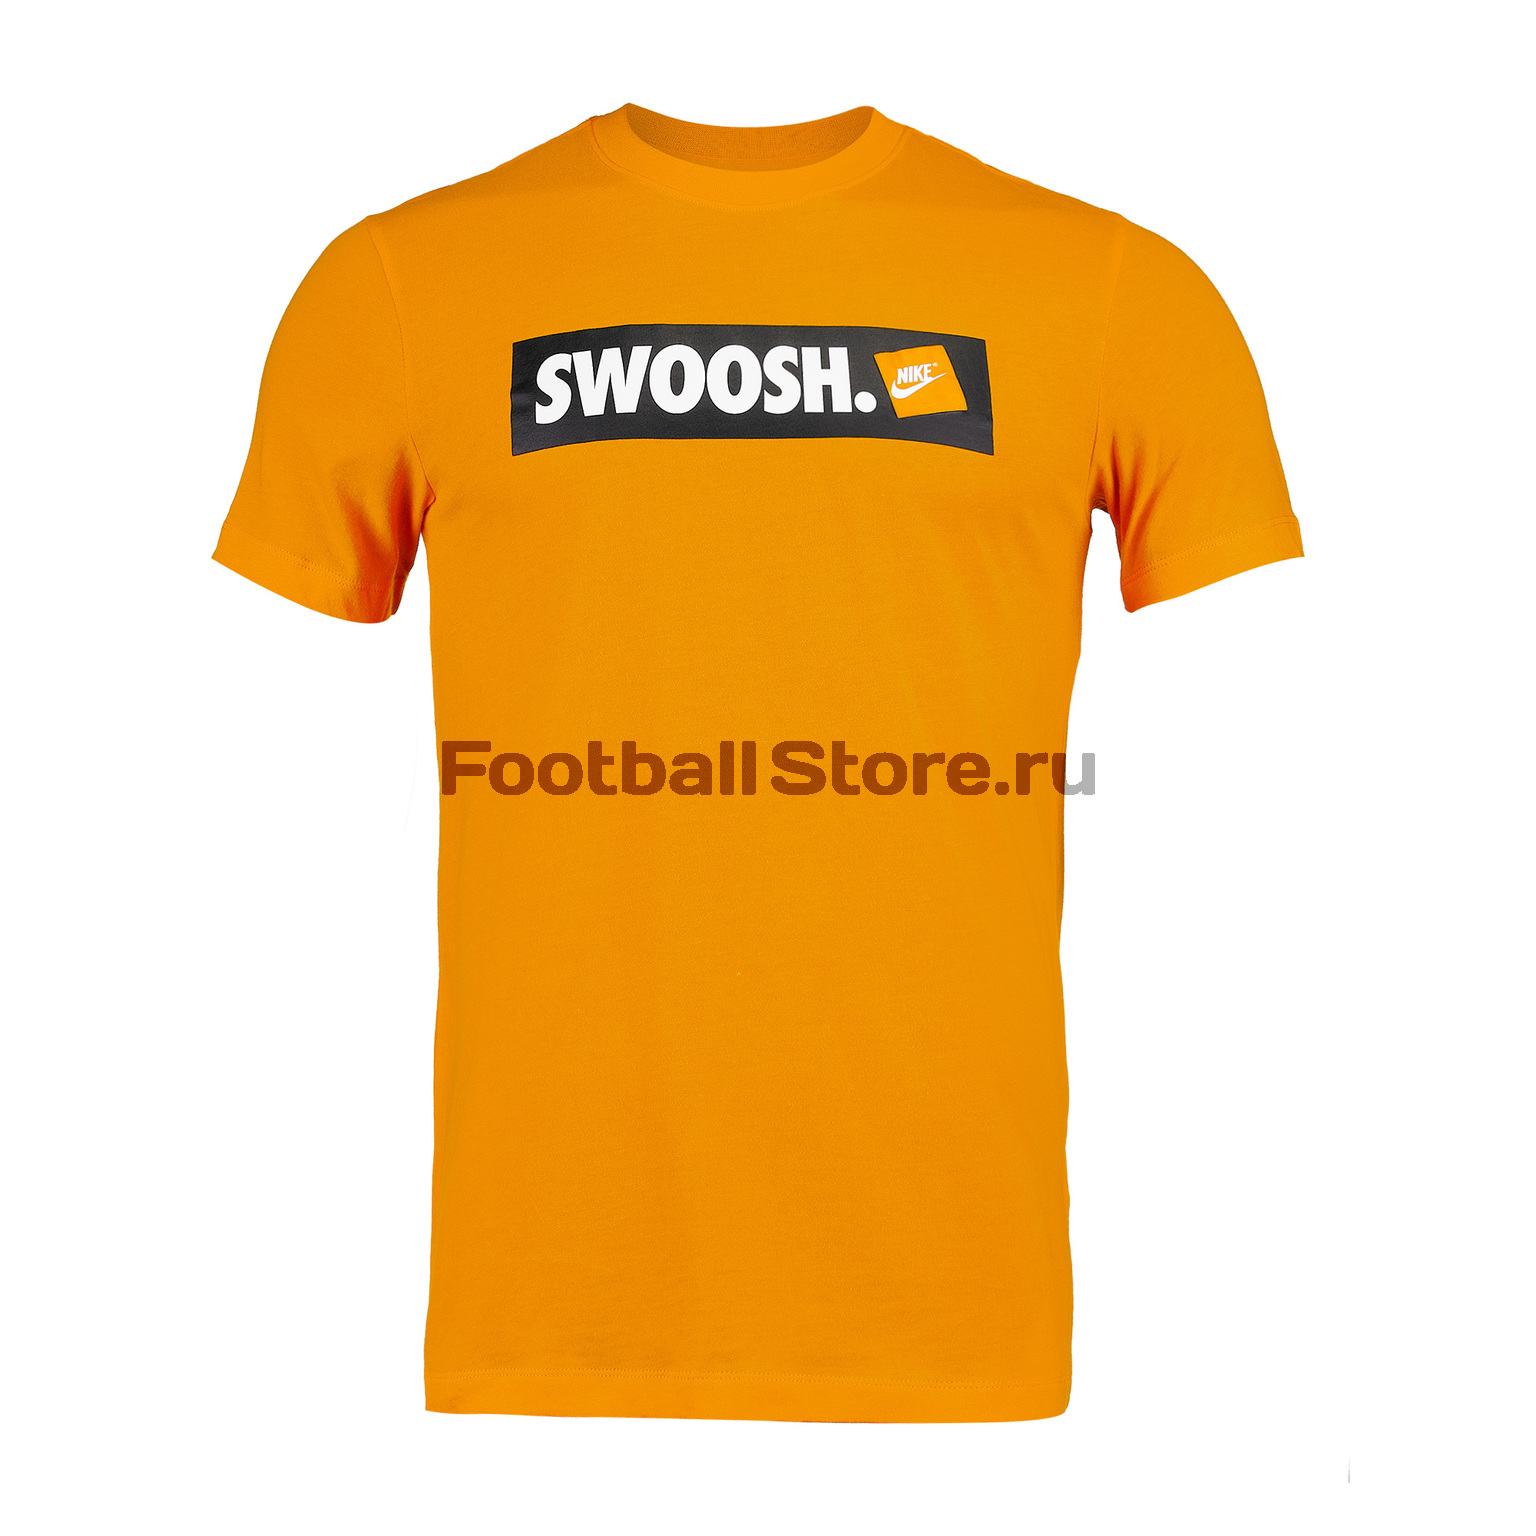 Футболка хлопковая Nike Tee Swoosh AR5027-833 футболка хлопковая nike tee club19 ss aj1504 451